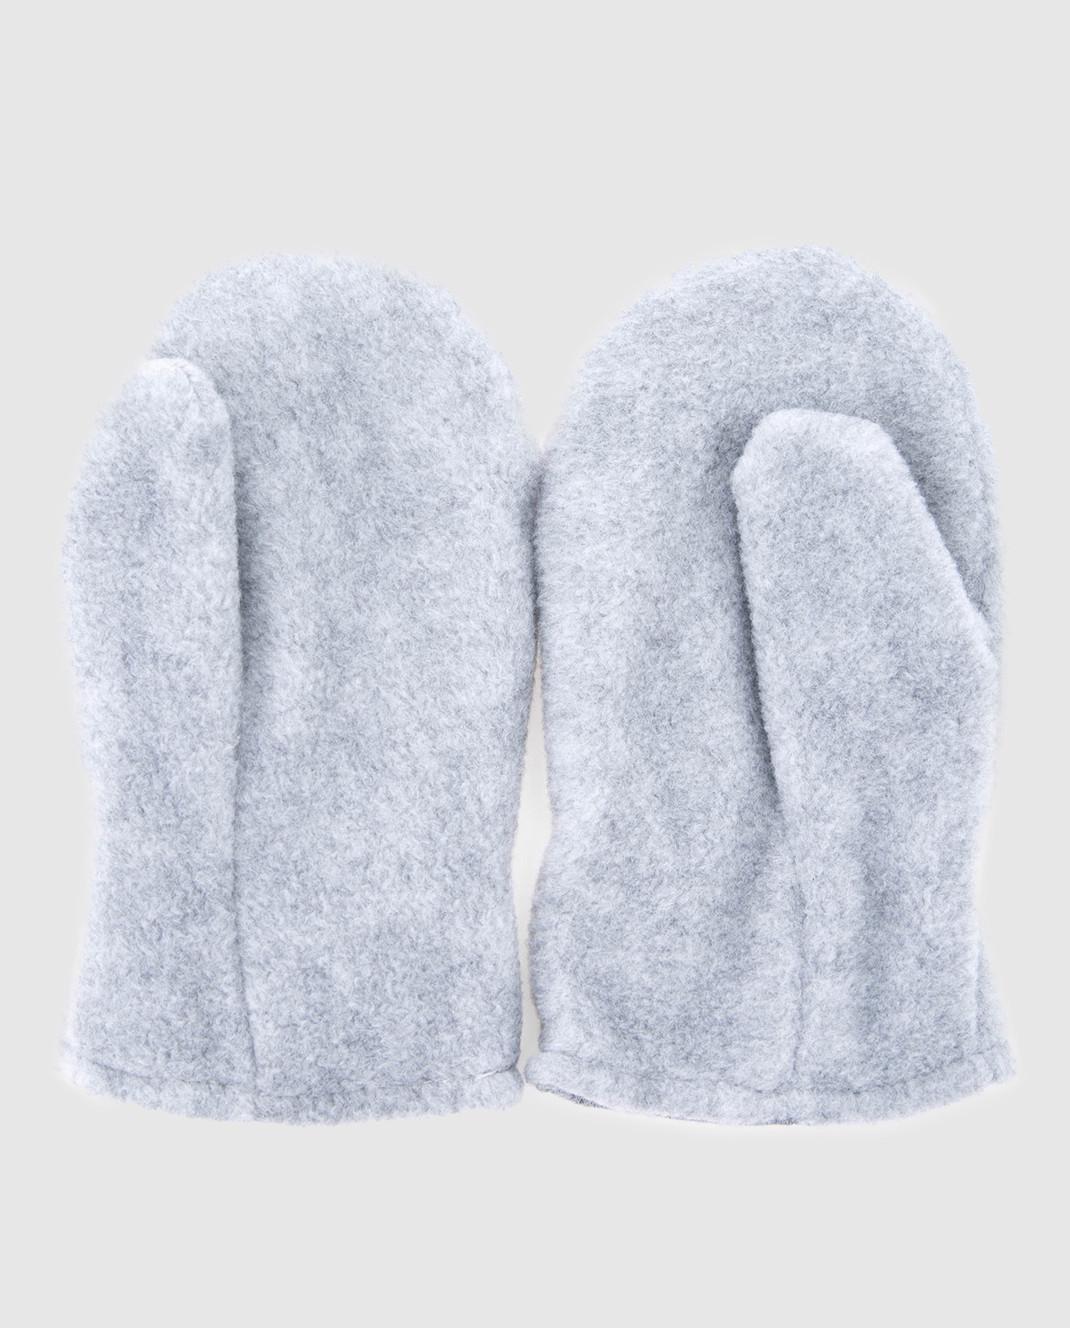 Moncler ENFANT Детские серые рукавицы 00509 изображение 2